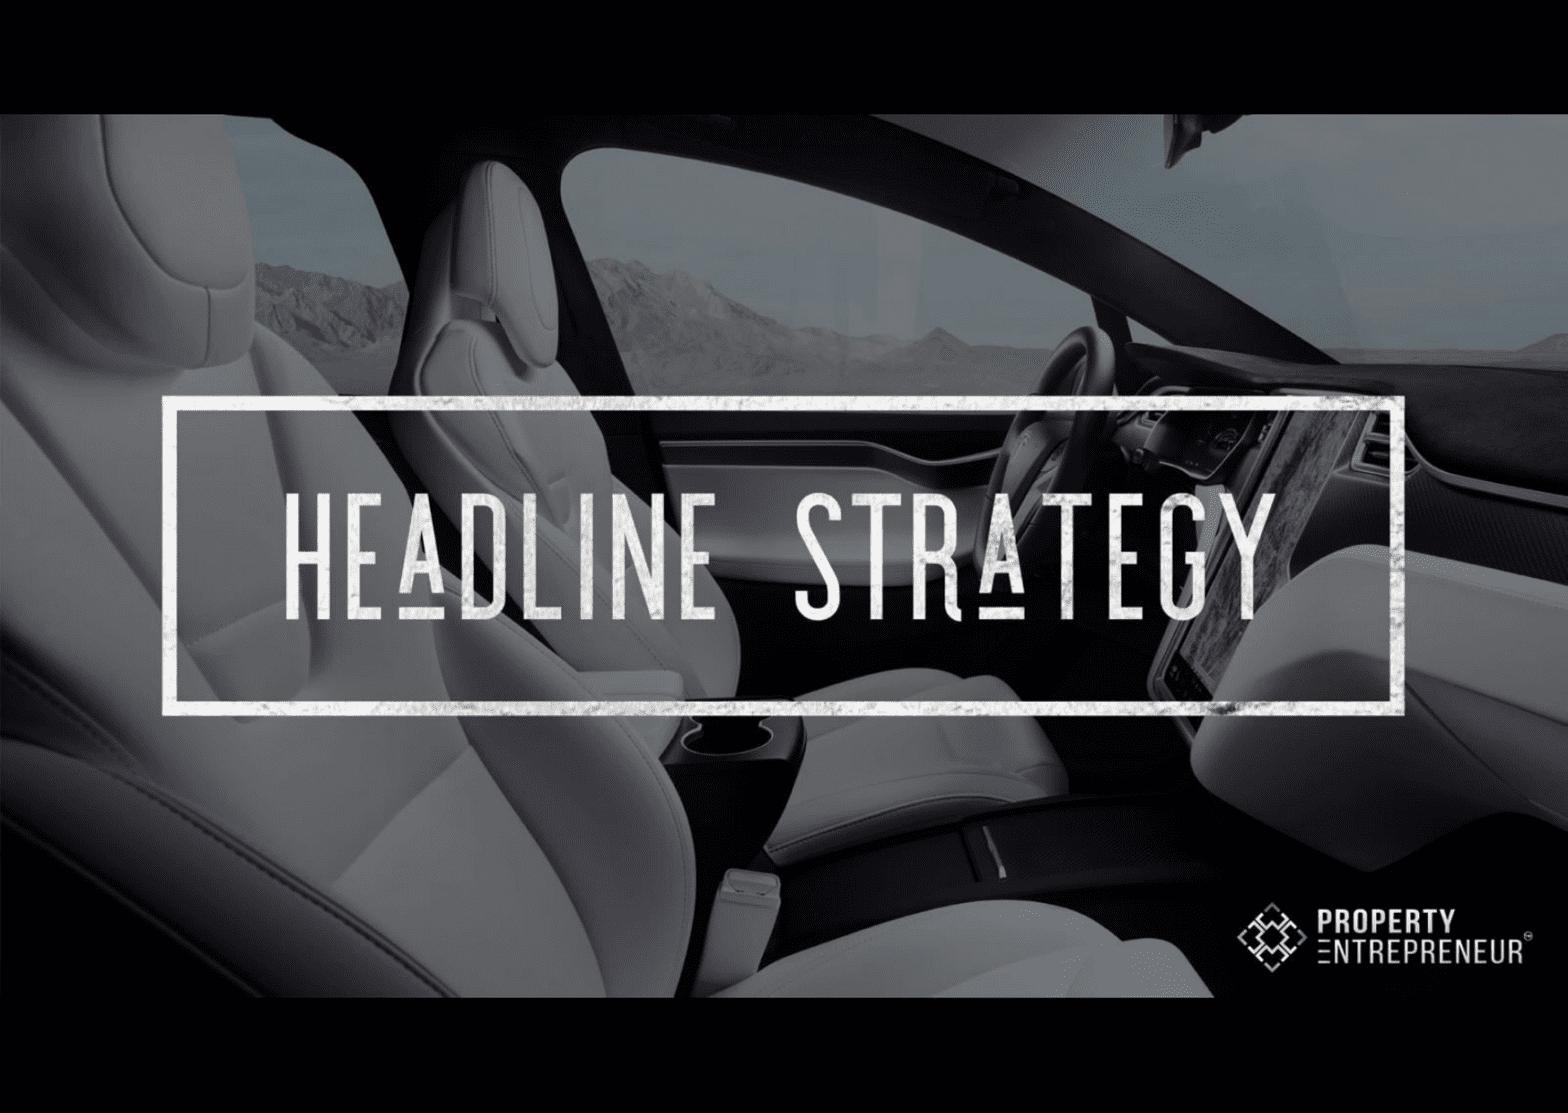 Headline Strategy